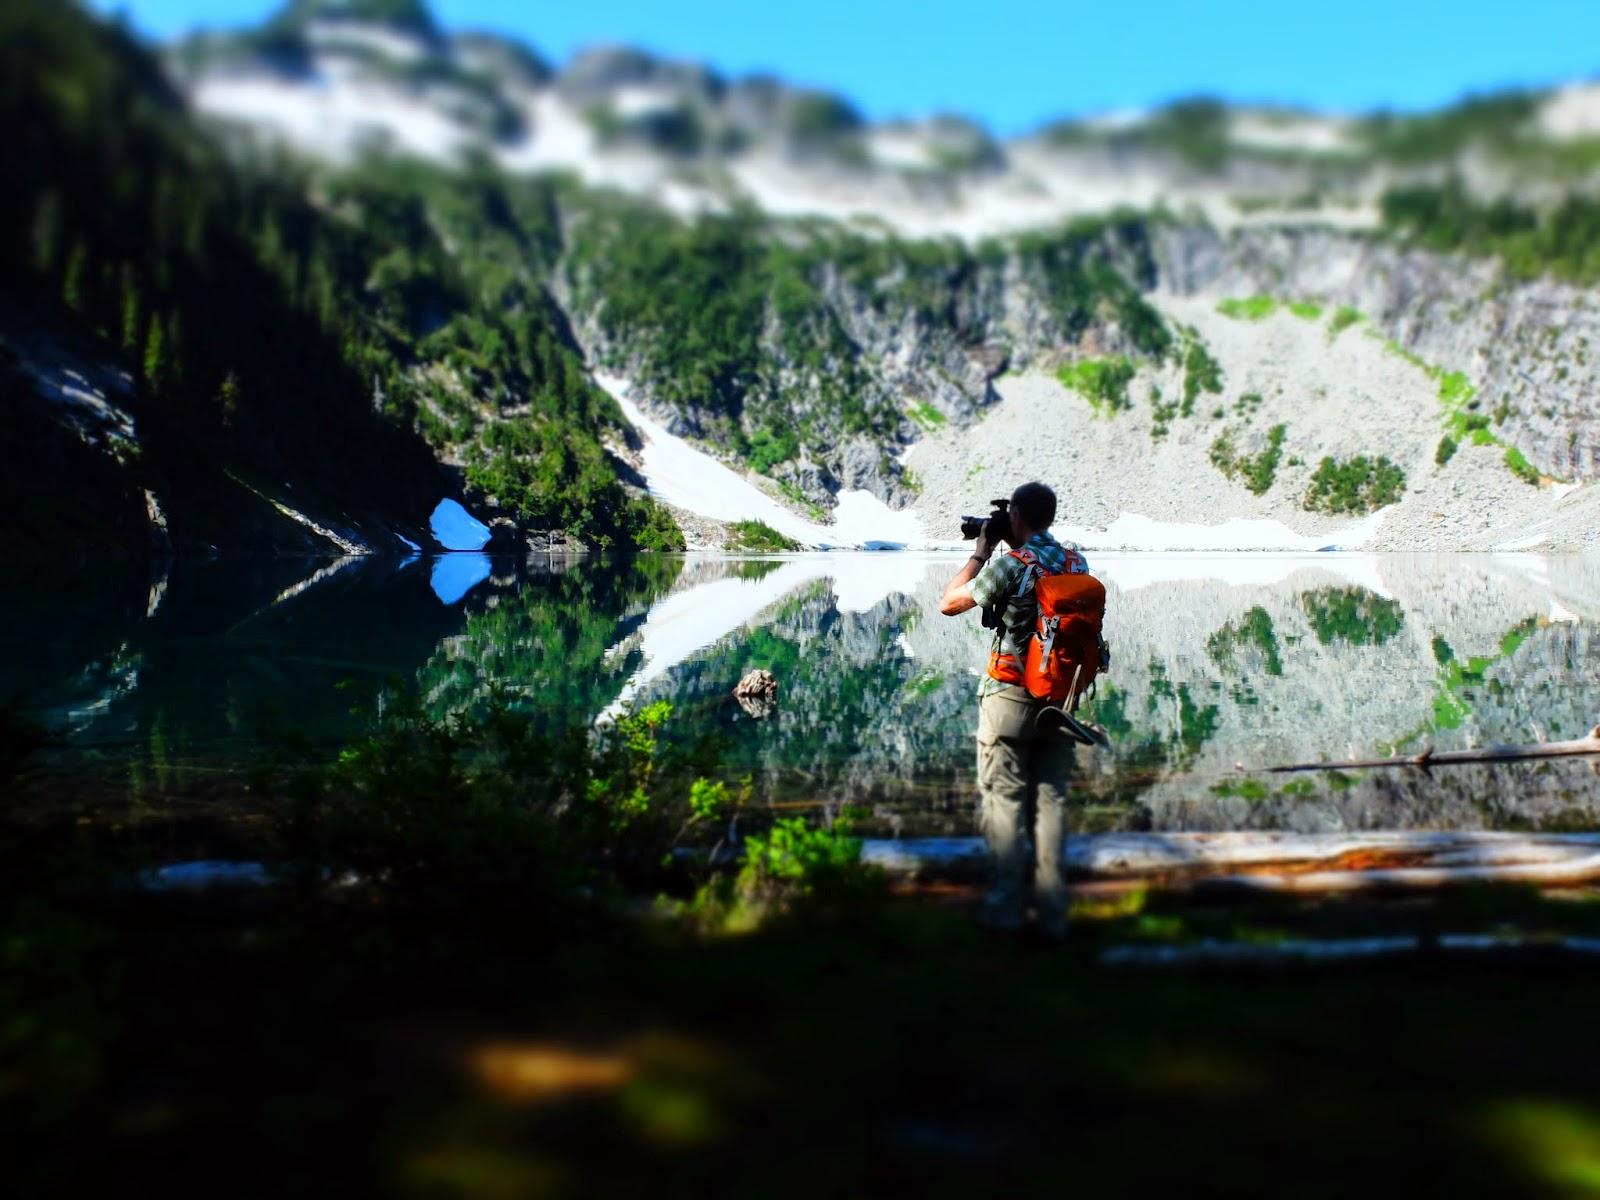 Viewing Malachite Lake Behind the Photographer (miniature effect)